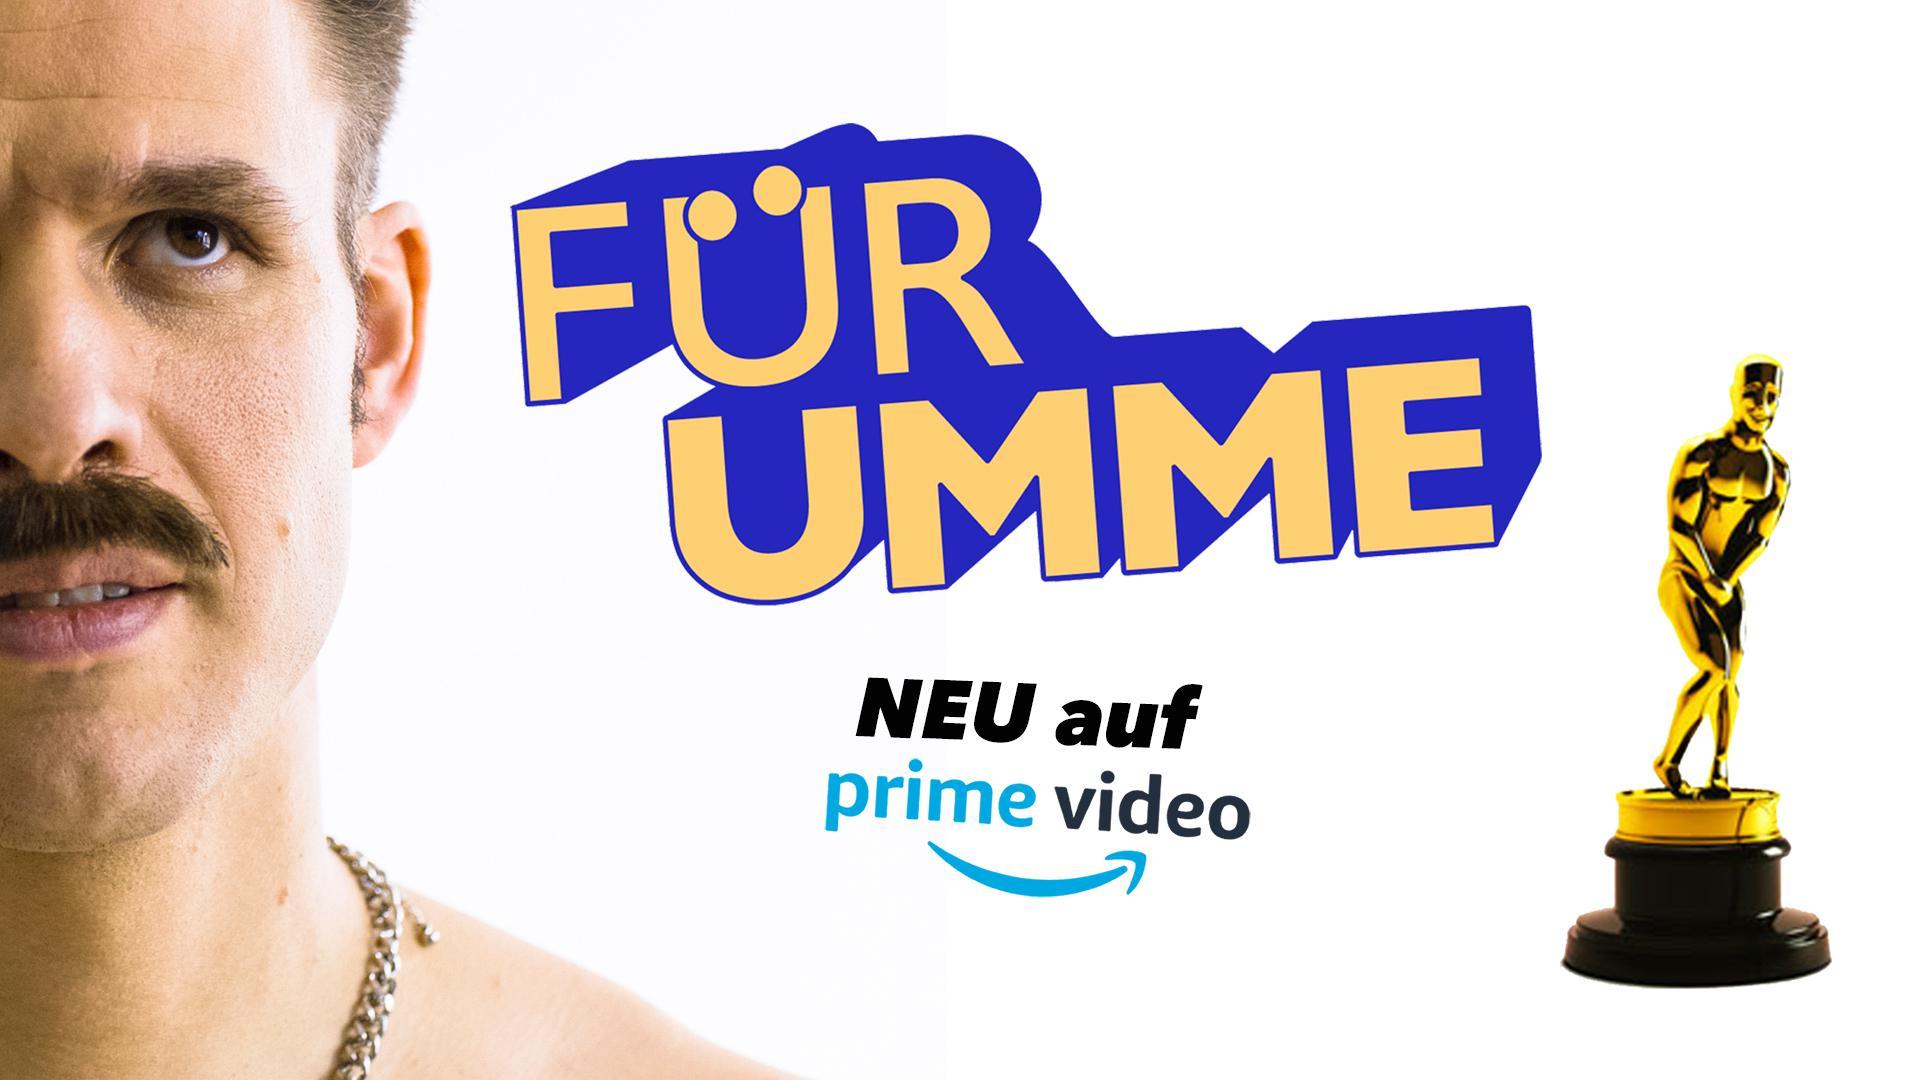 For Peanuts // FÜR UMME